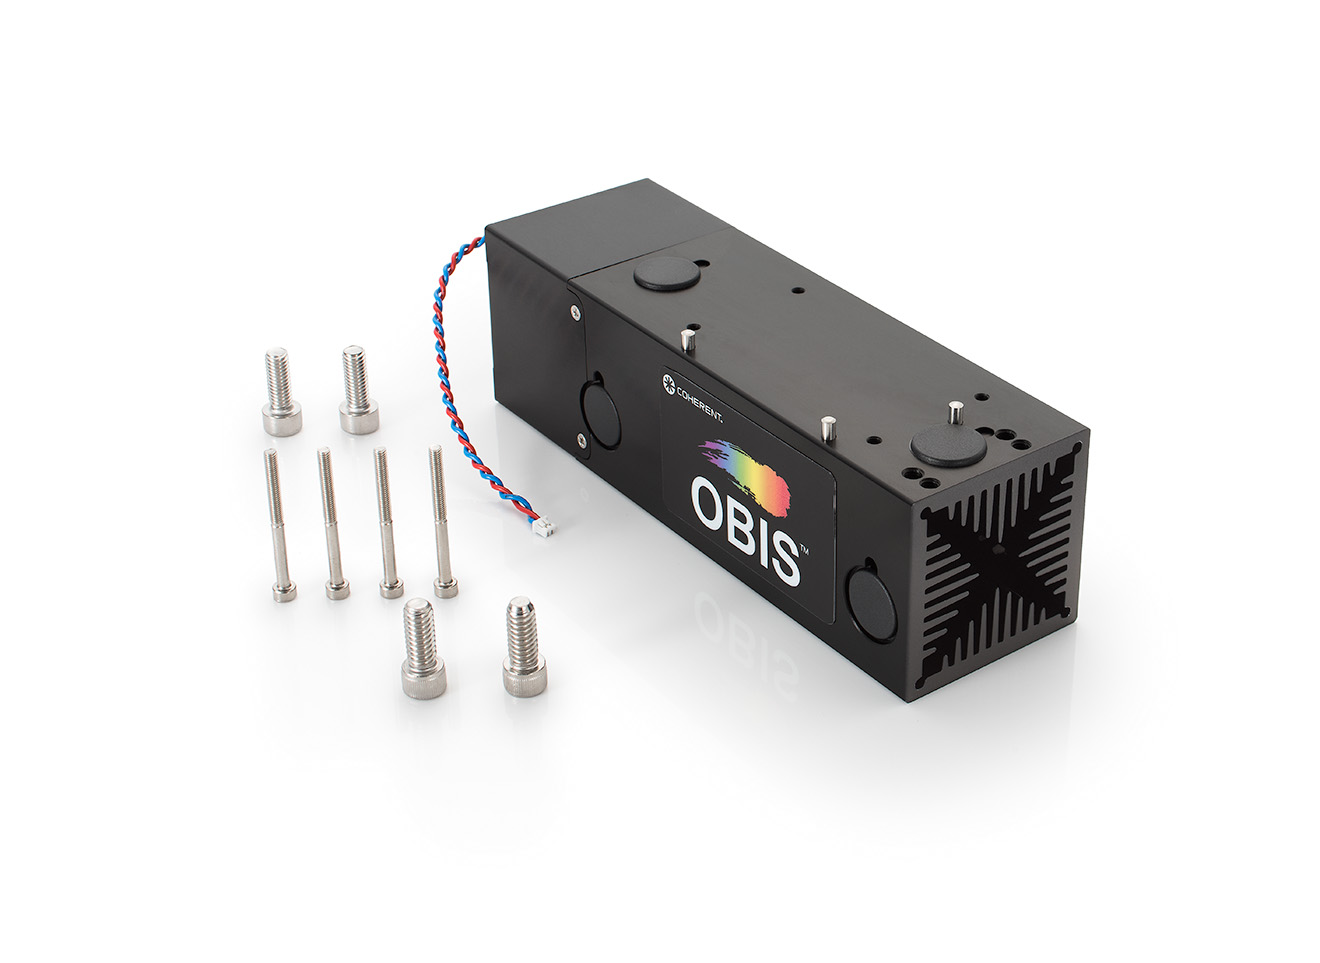 OBIS LX/LS Heat Sink Front